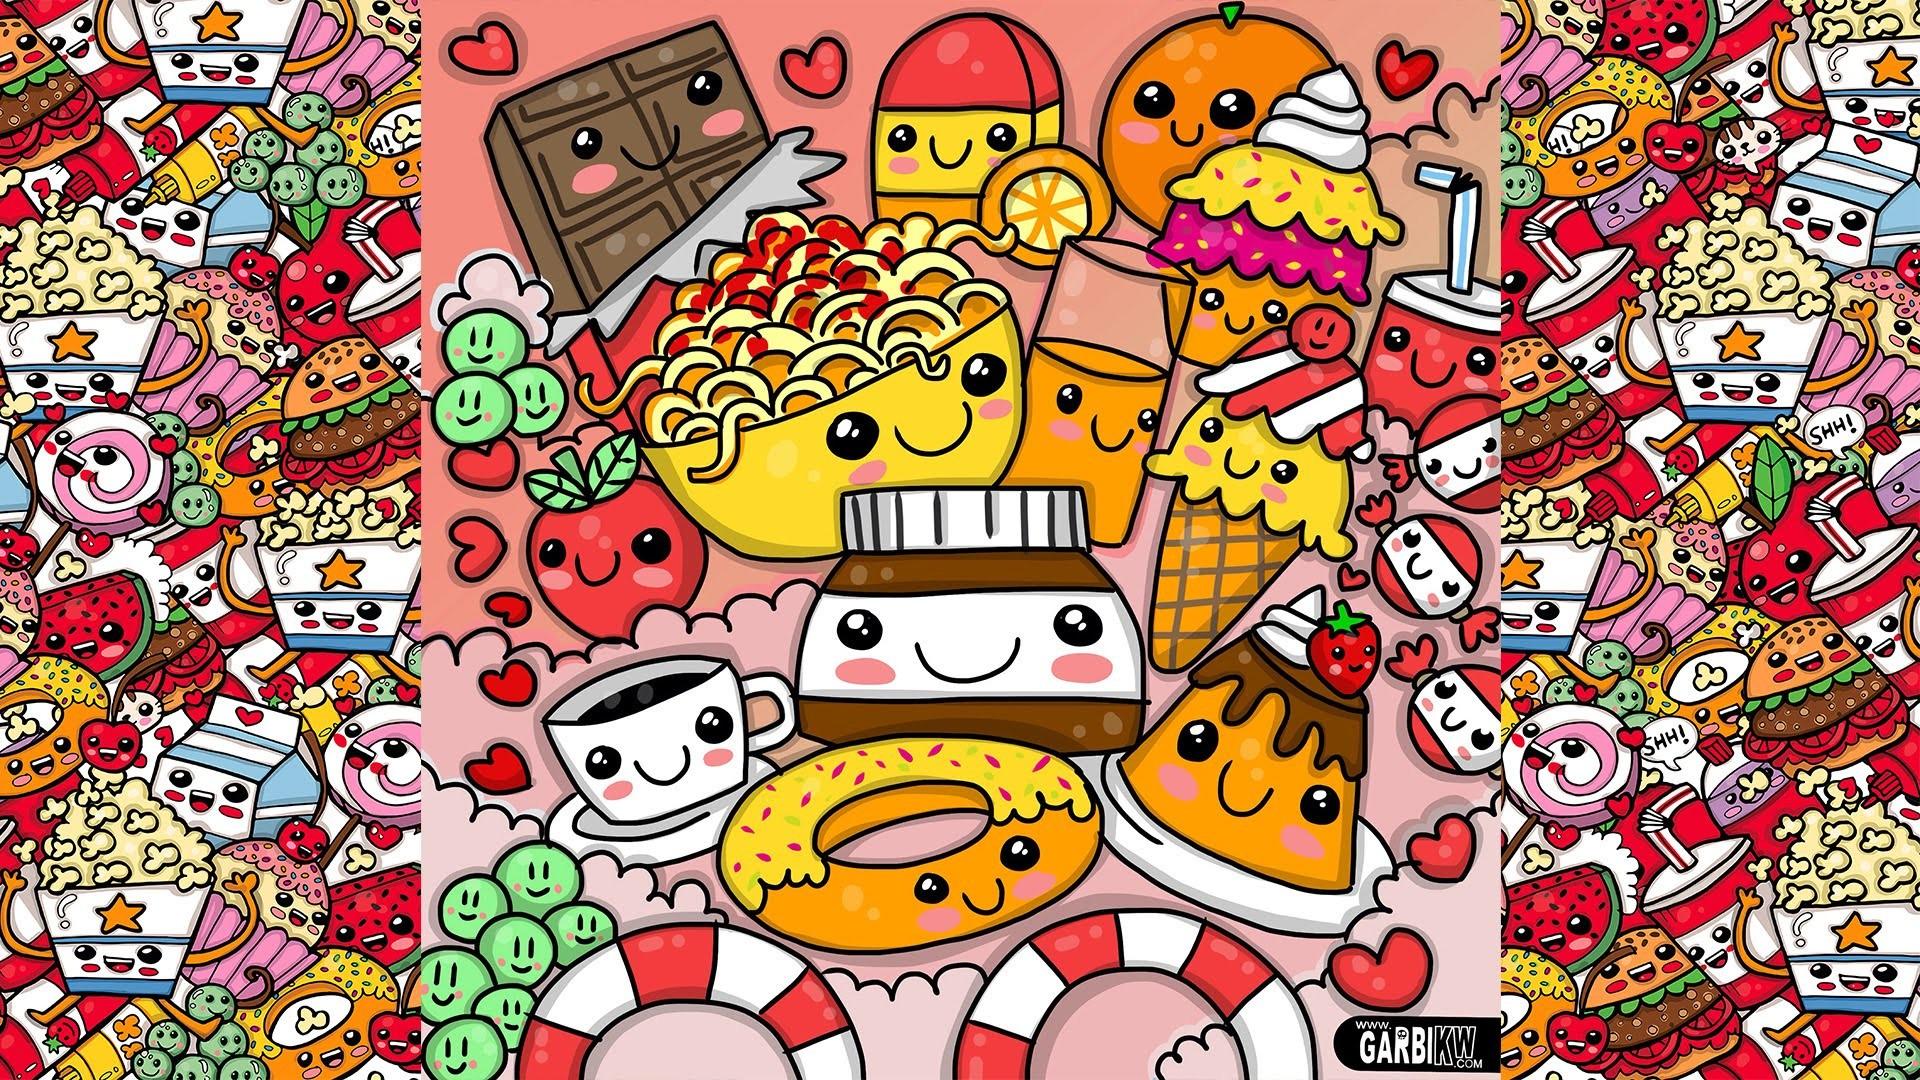 1920x1080 Cute Food Wallpaper Desktop